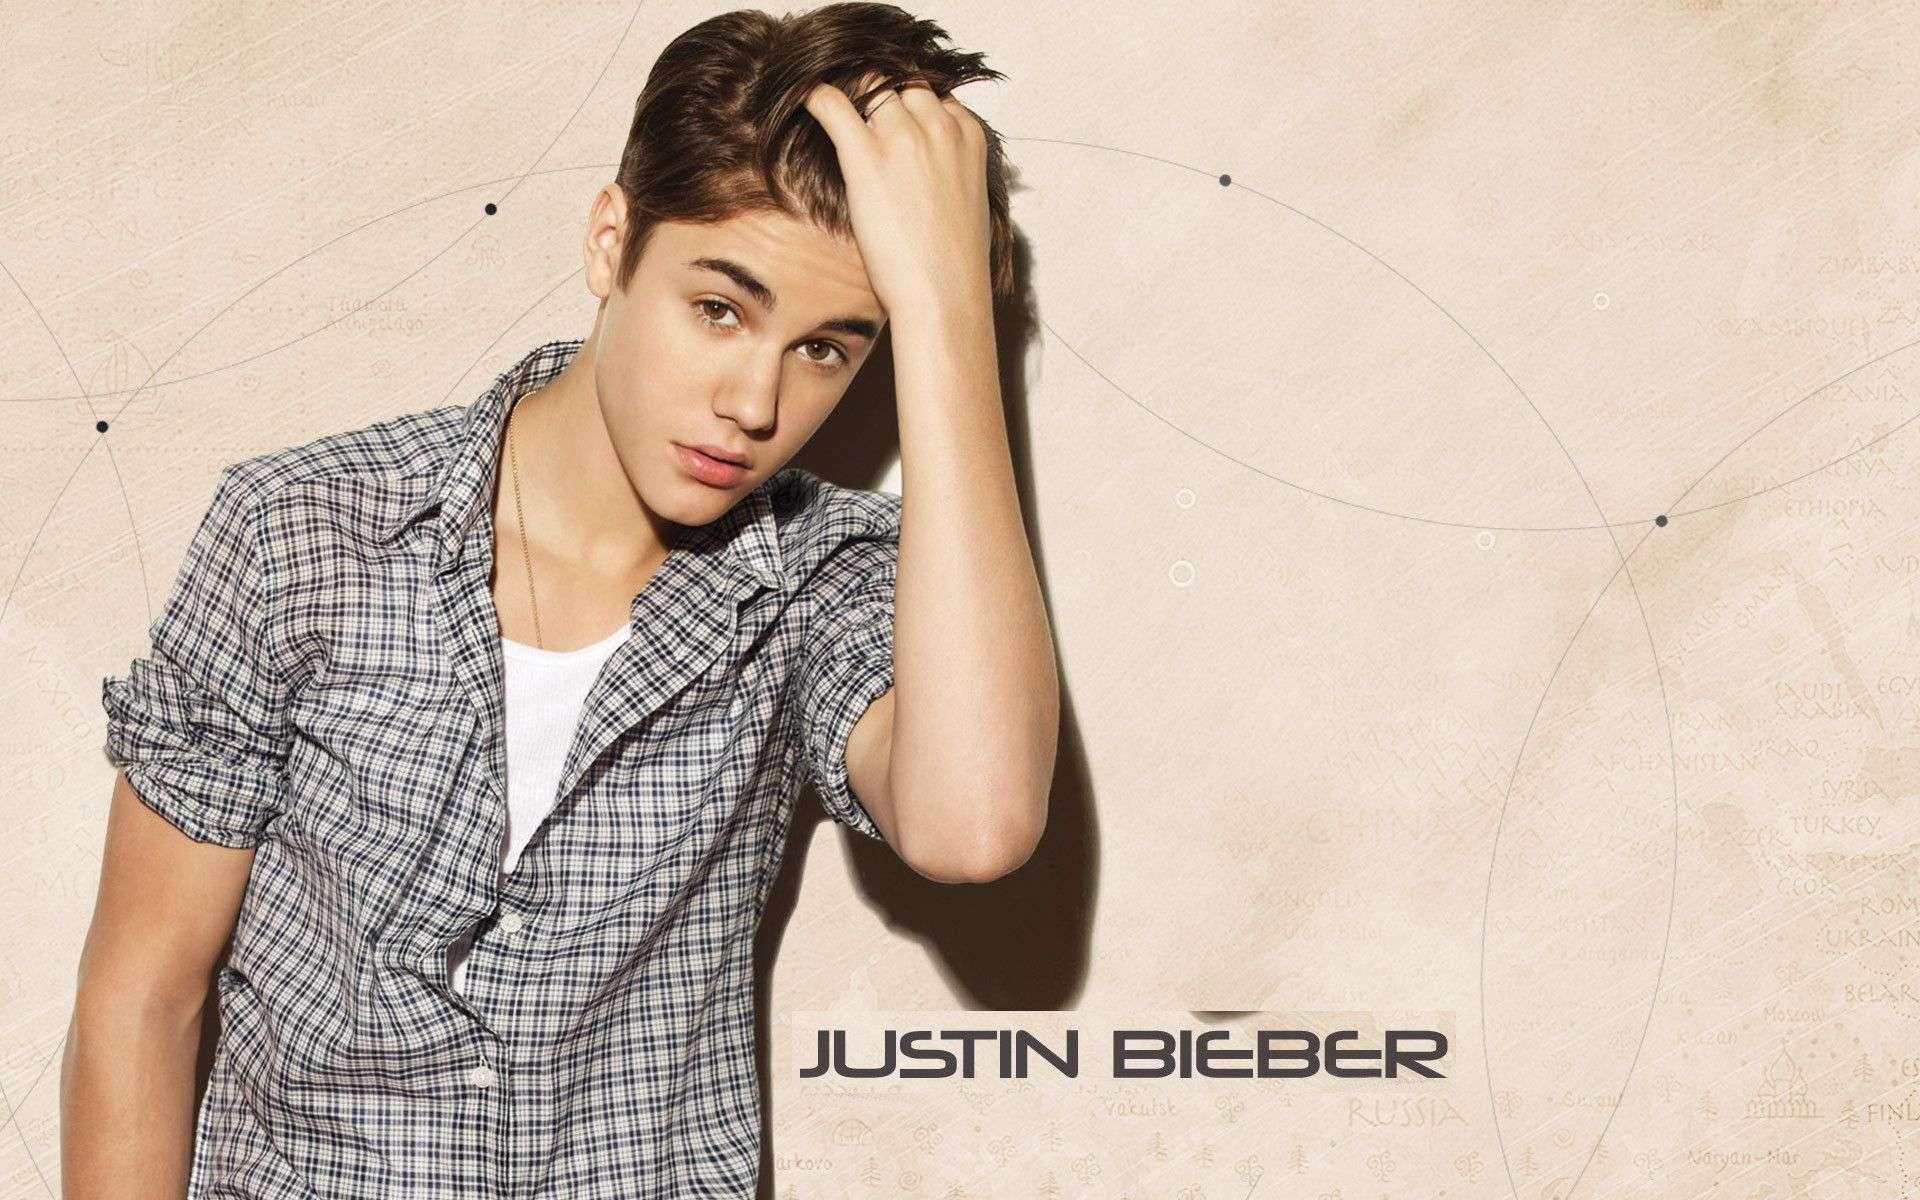 Justin Bieber Latest Photoshoot Full Hd Wallpaper: Justin Bieber Wallpapers HD 2016